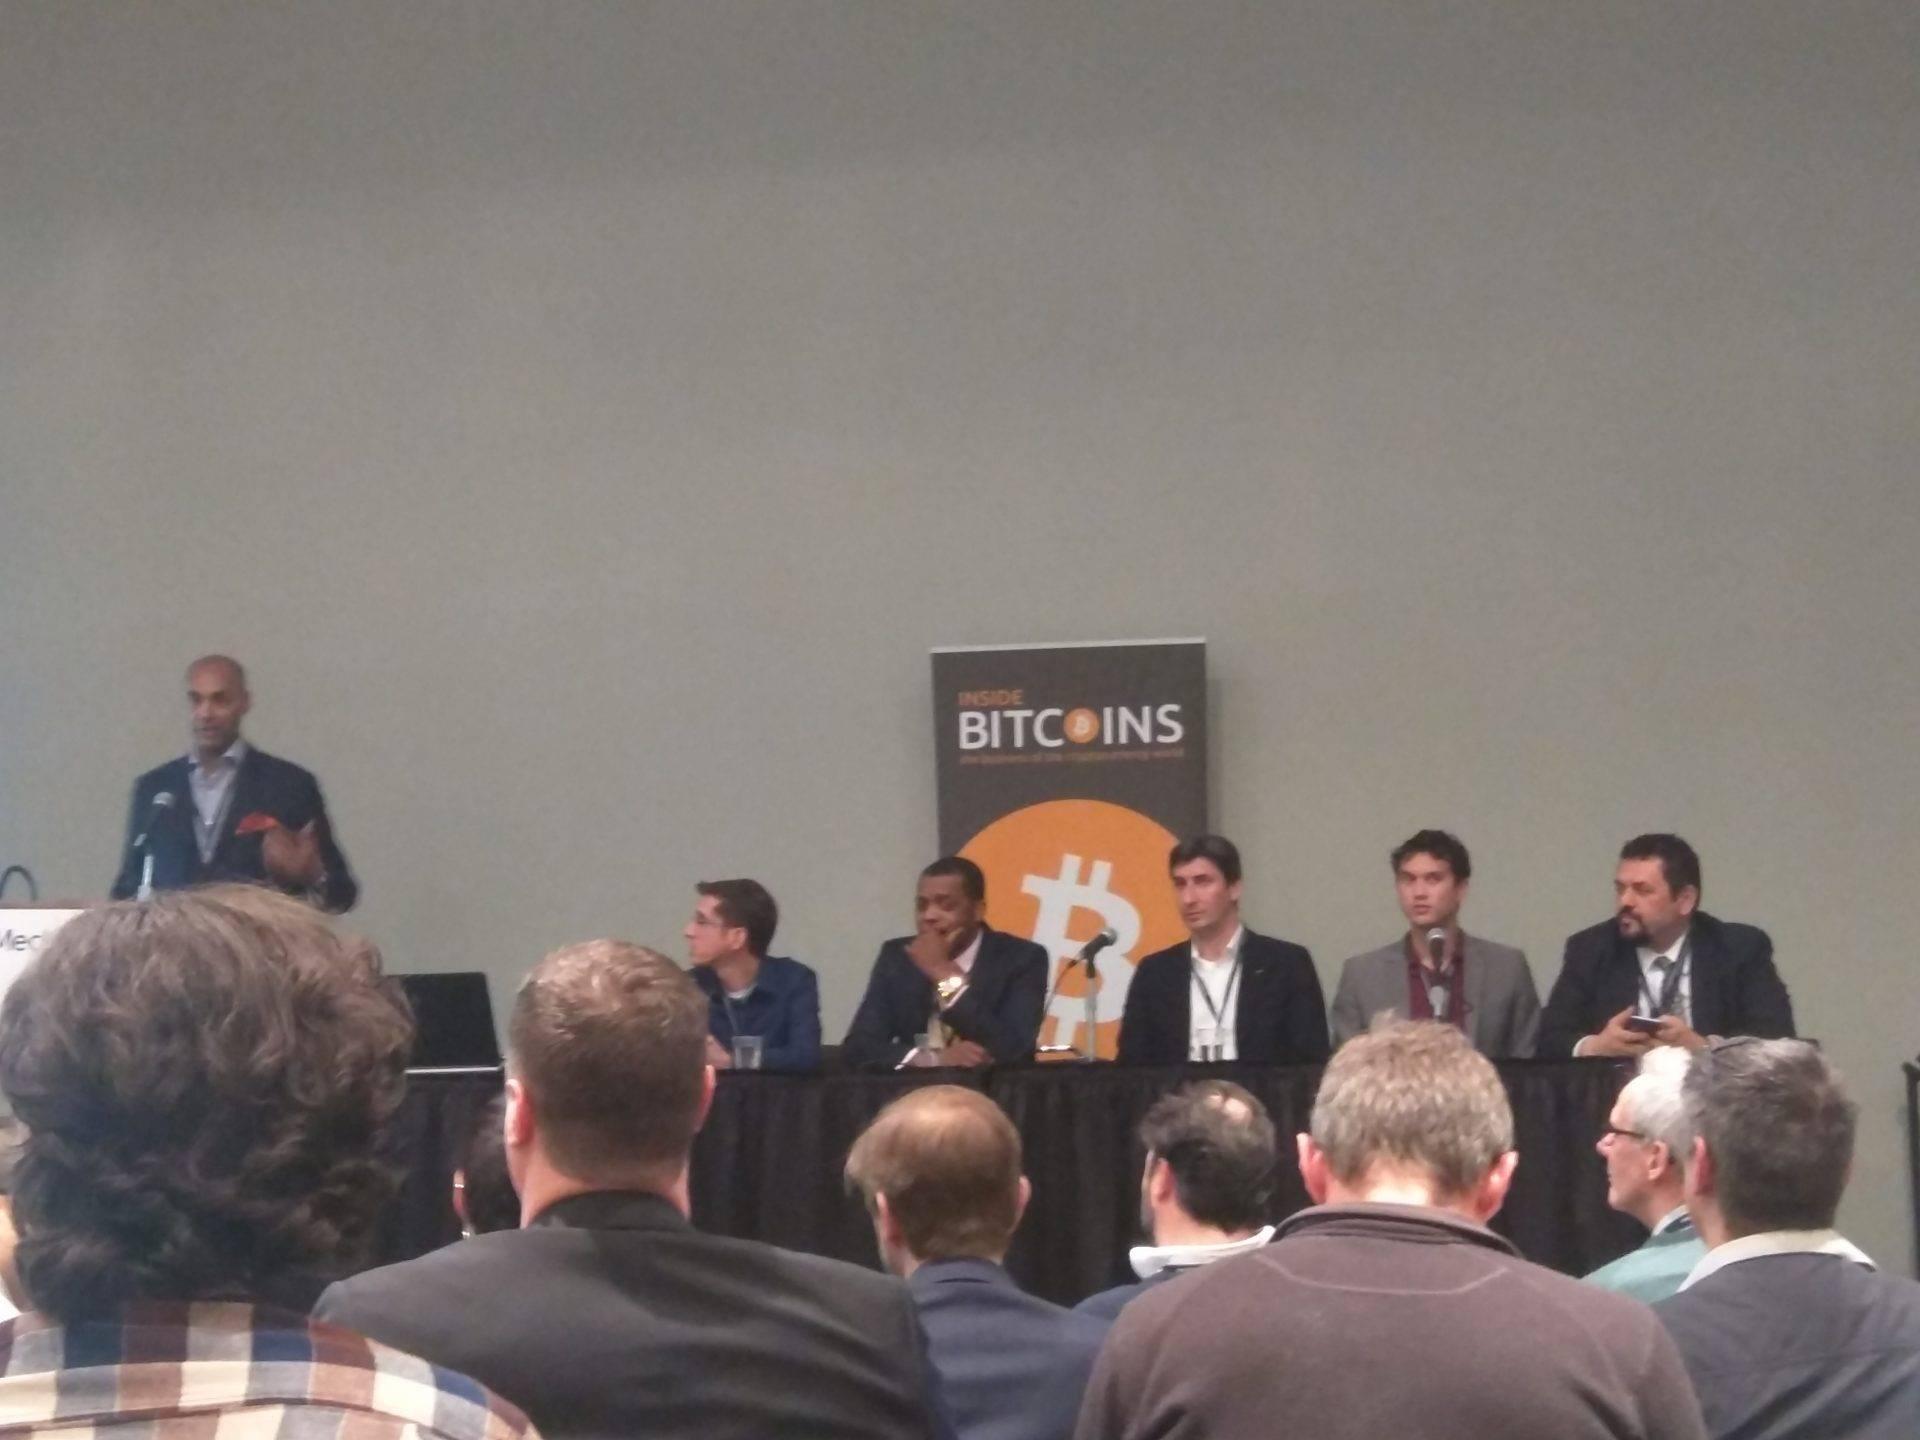 Inside Bitcoins Bitcoin 2.0 Panel